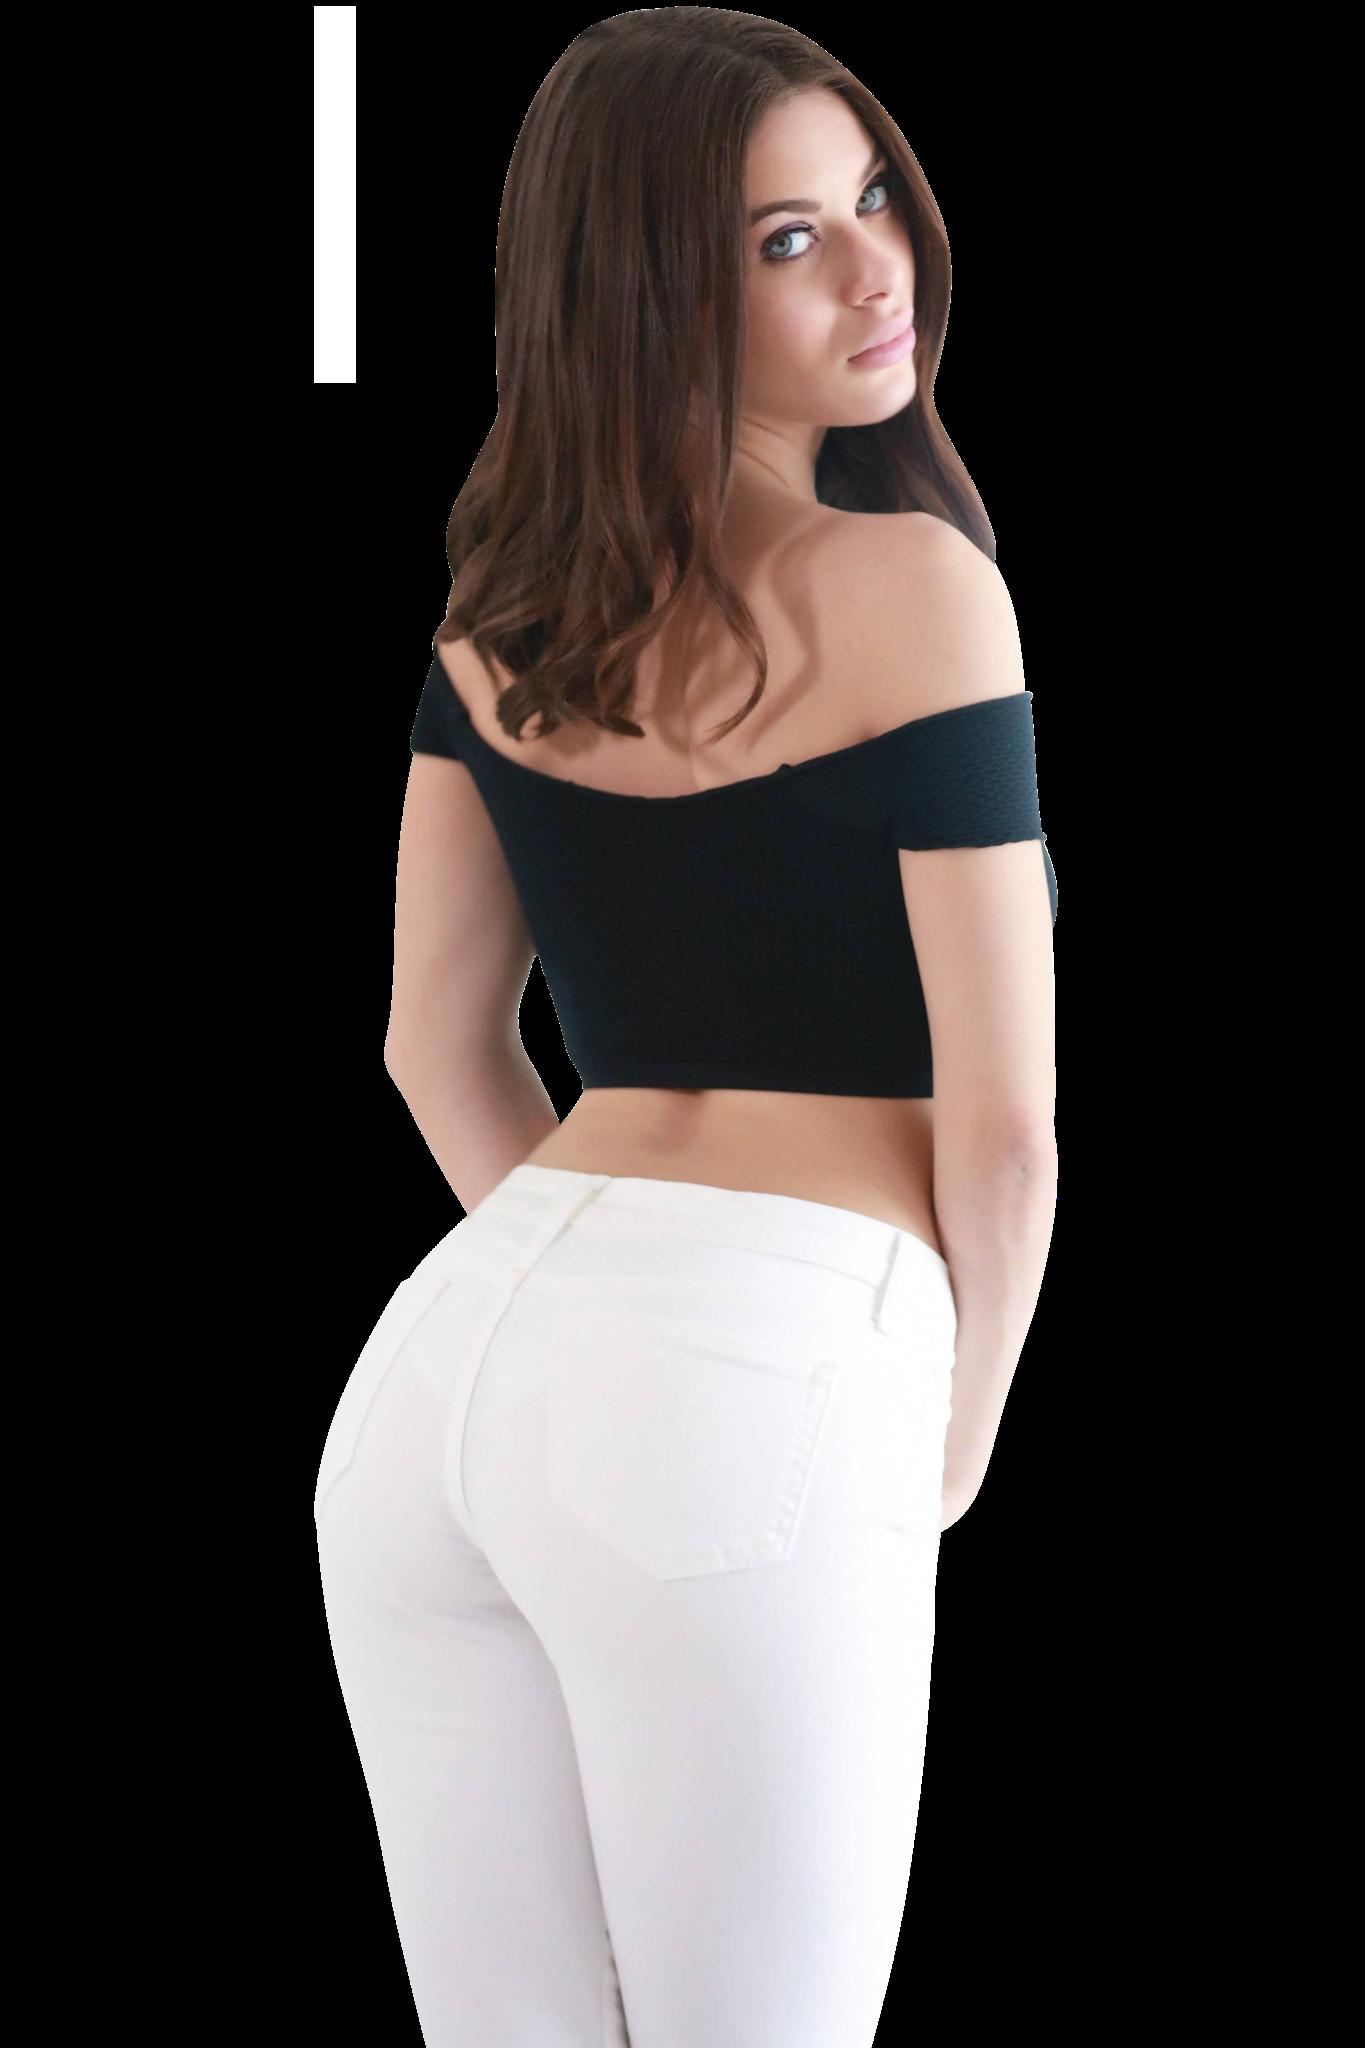 Lana Rhoades wearing White Jeans